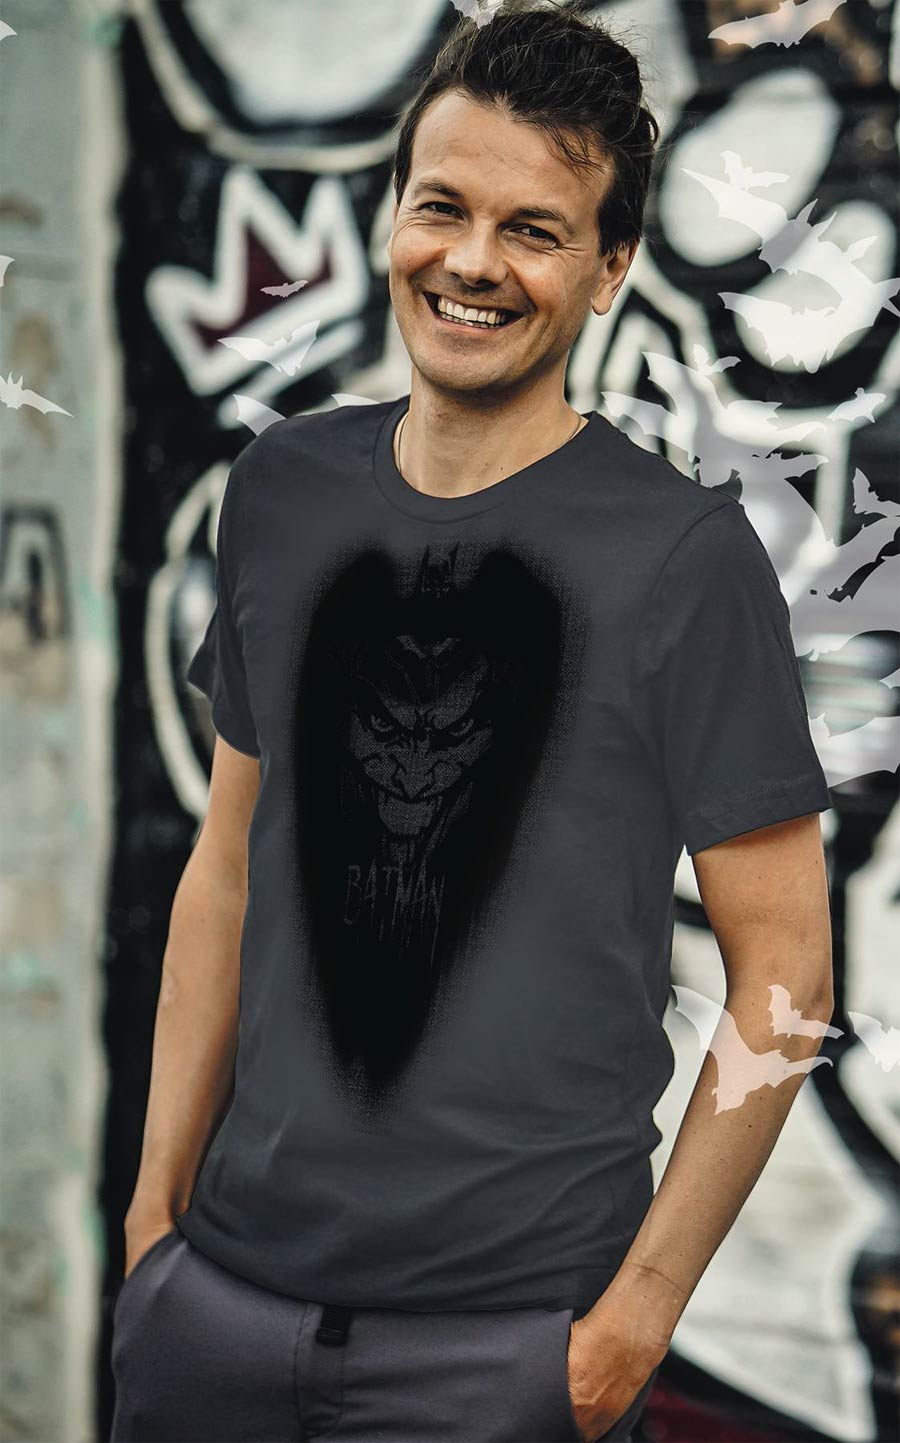 Batman Inside Joke T-Shirt Large